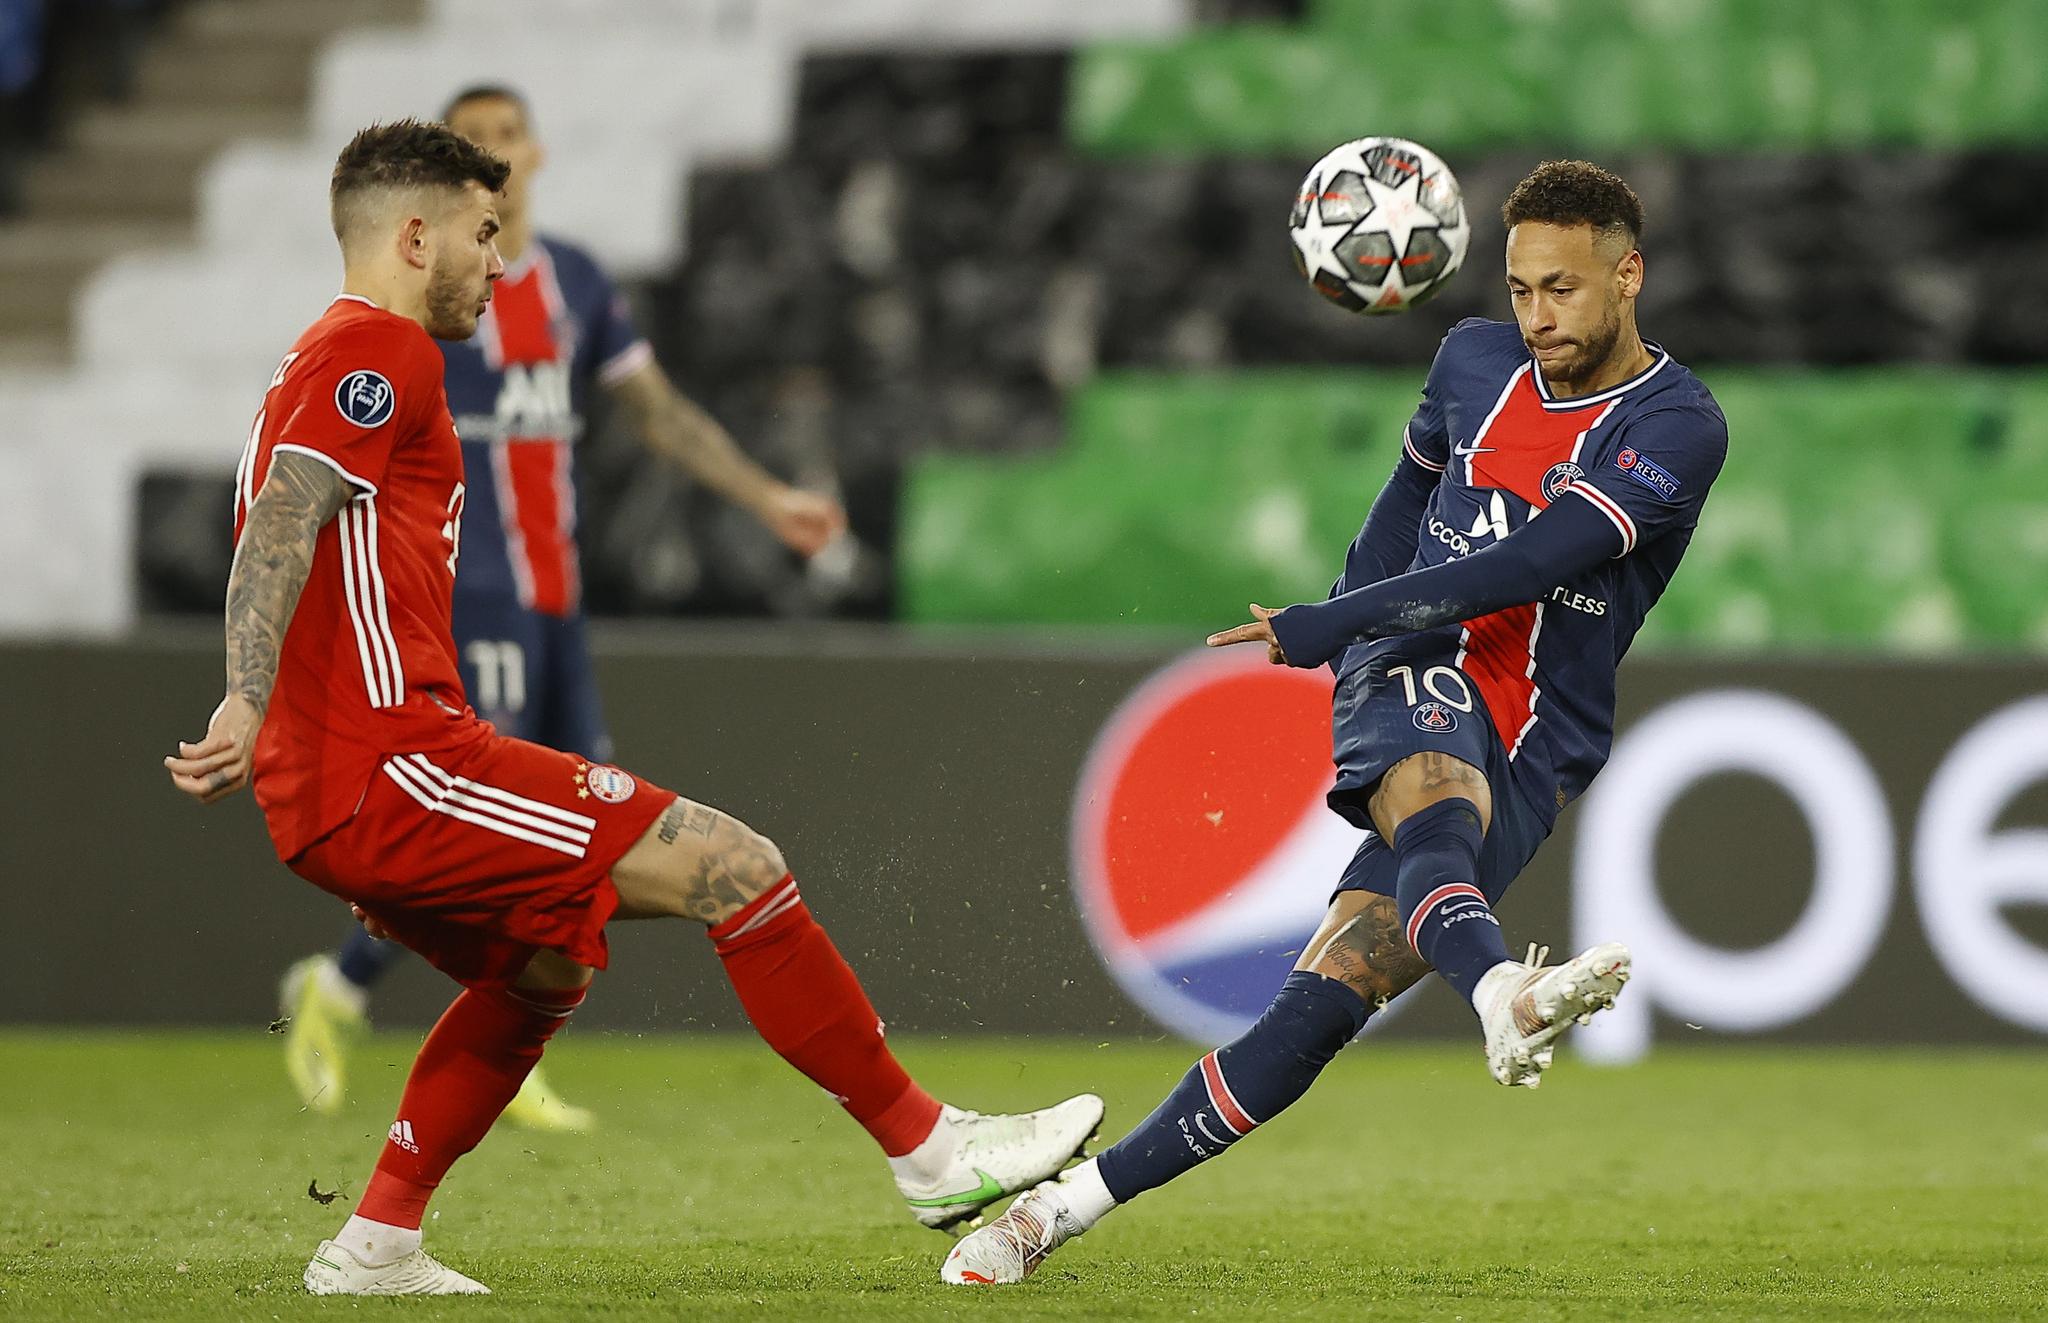 PSG의 유럽 챔피언스리그 4강행을 이끈 네이마르(오른쪽). [EPA=연합뉴스]